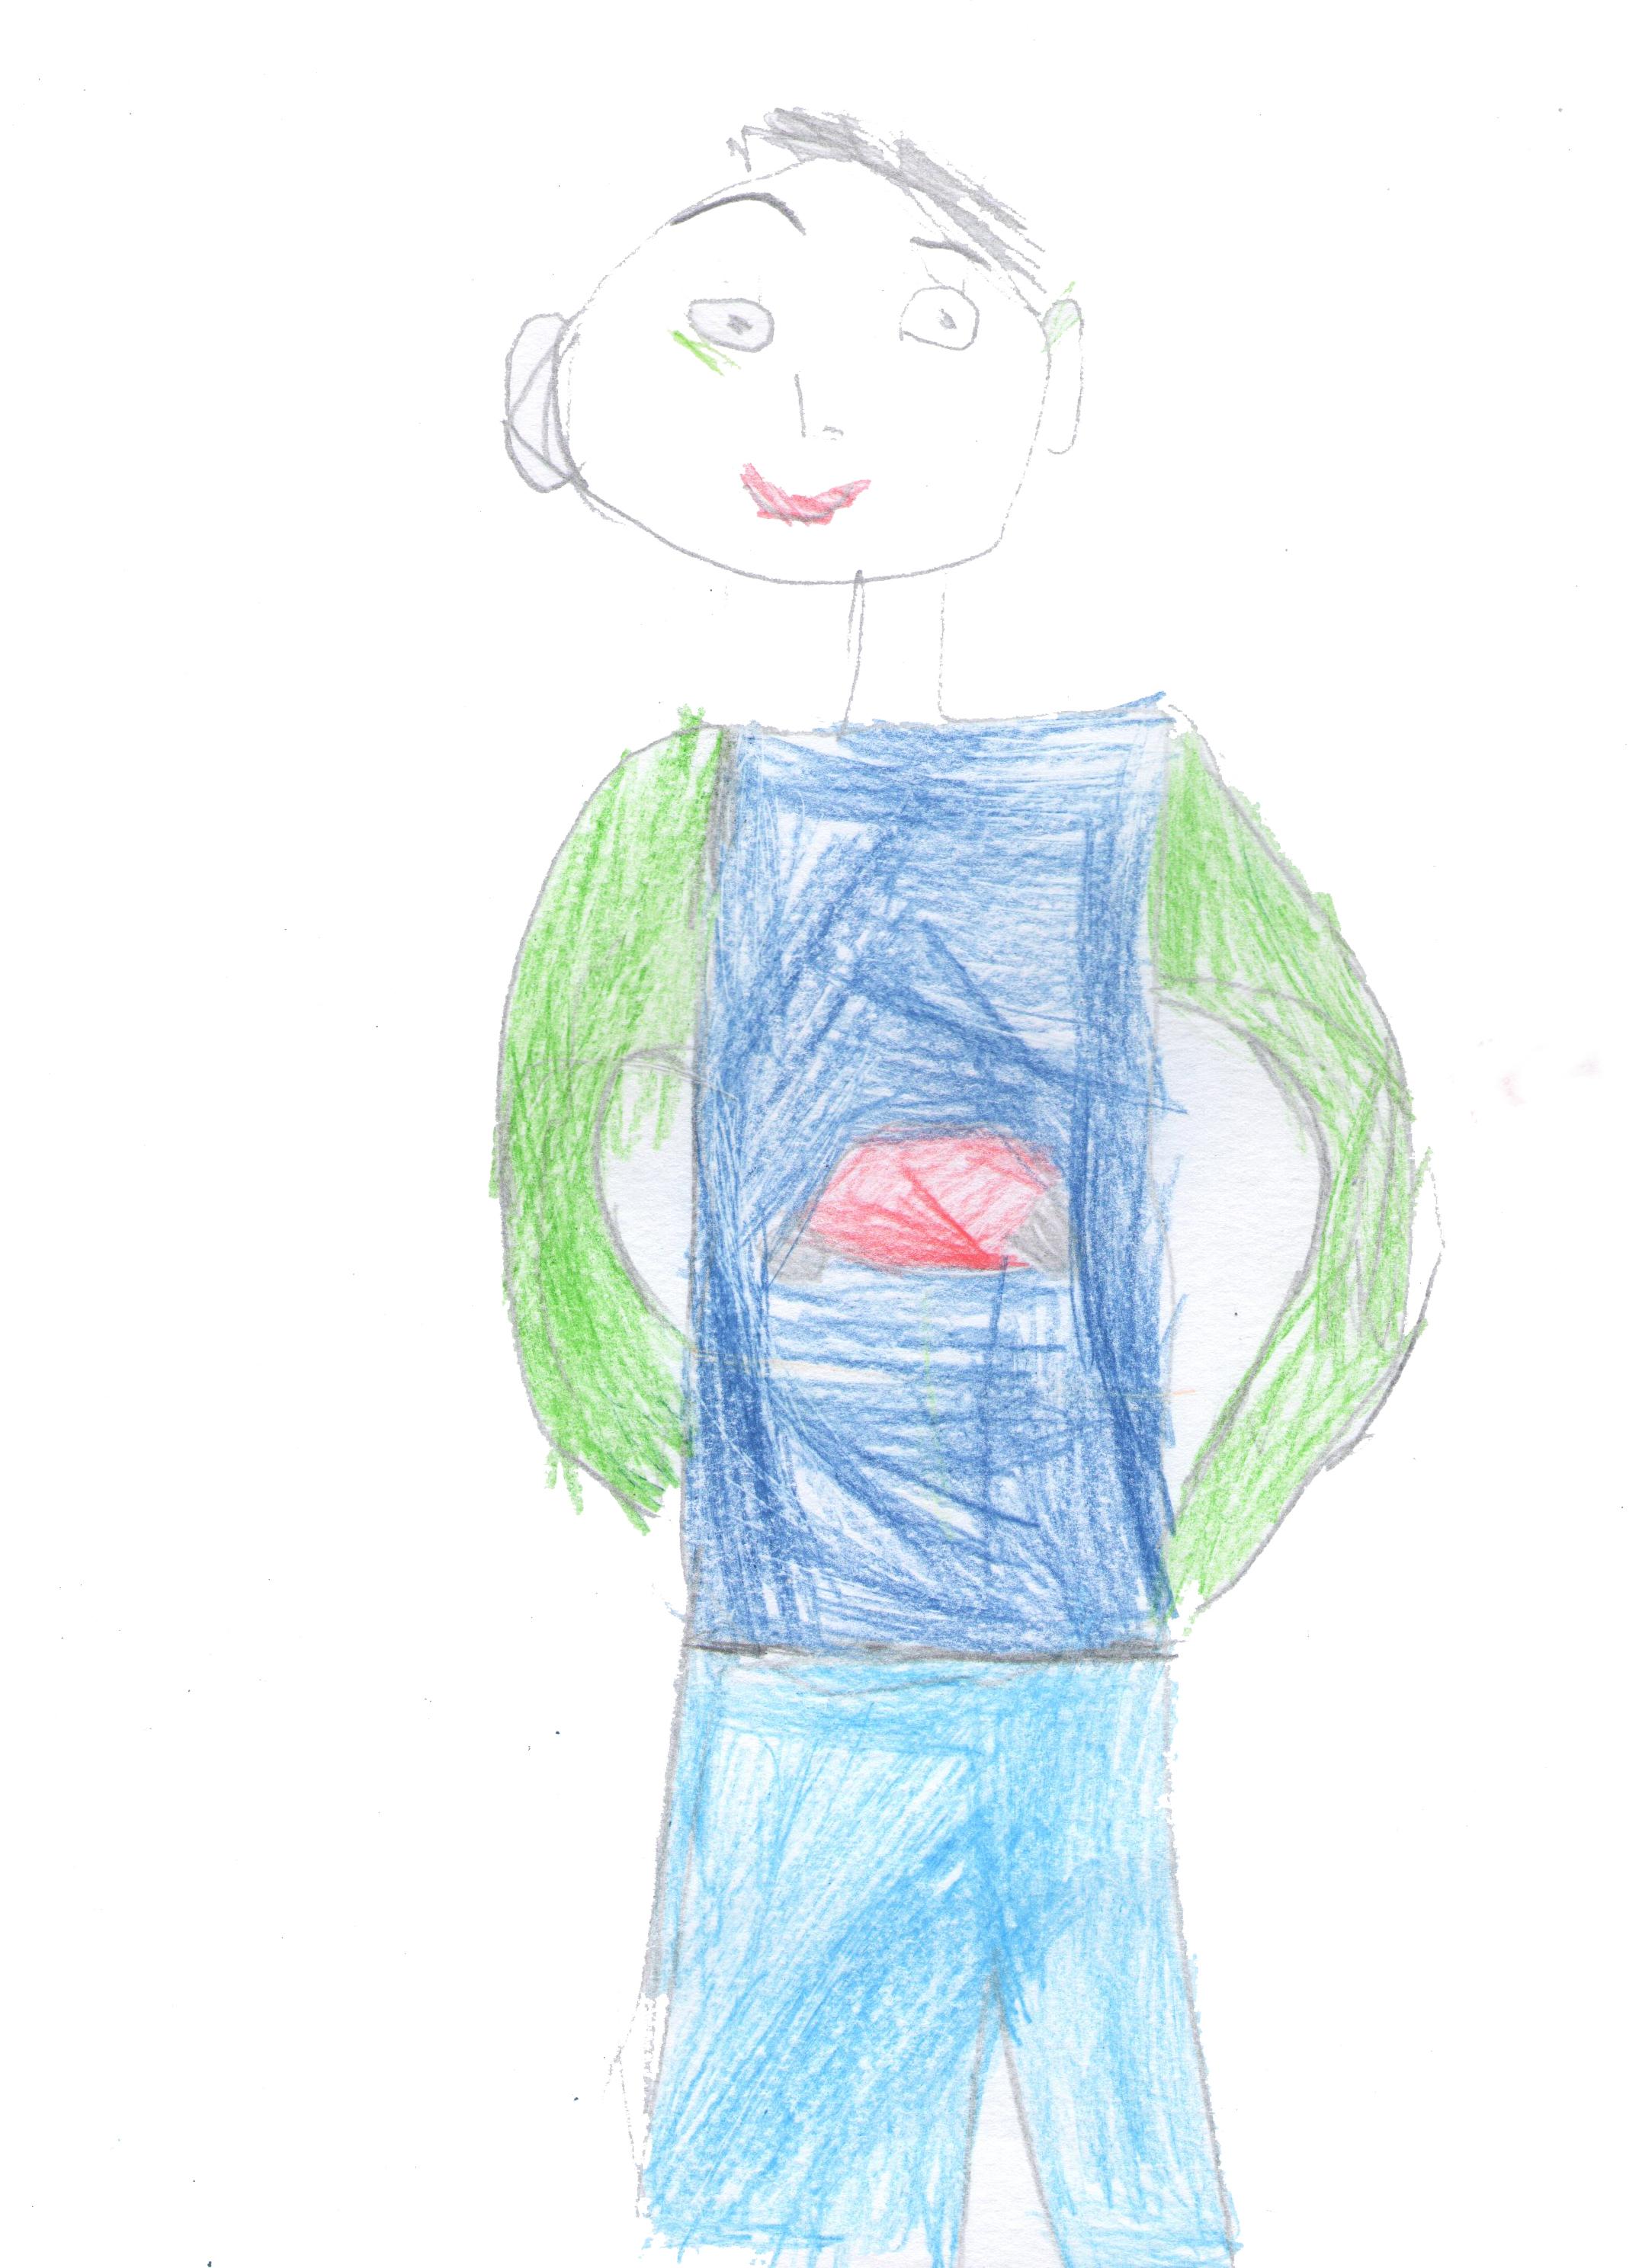 Gambar Sketsa Gambar Seni Anak Ilustrasi Mode Desain Busana